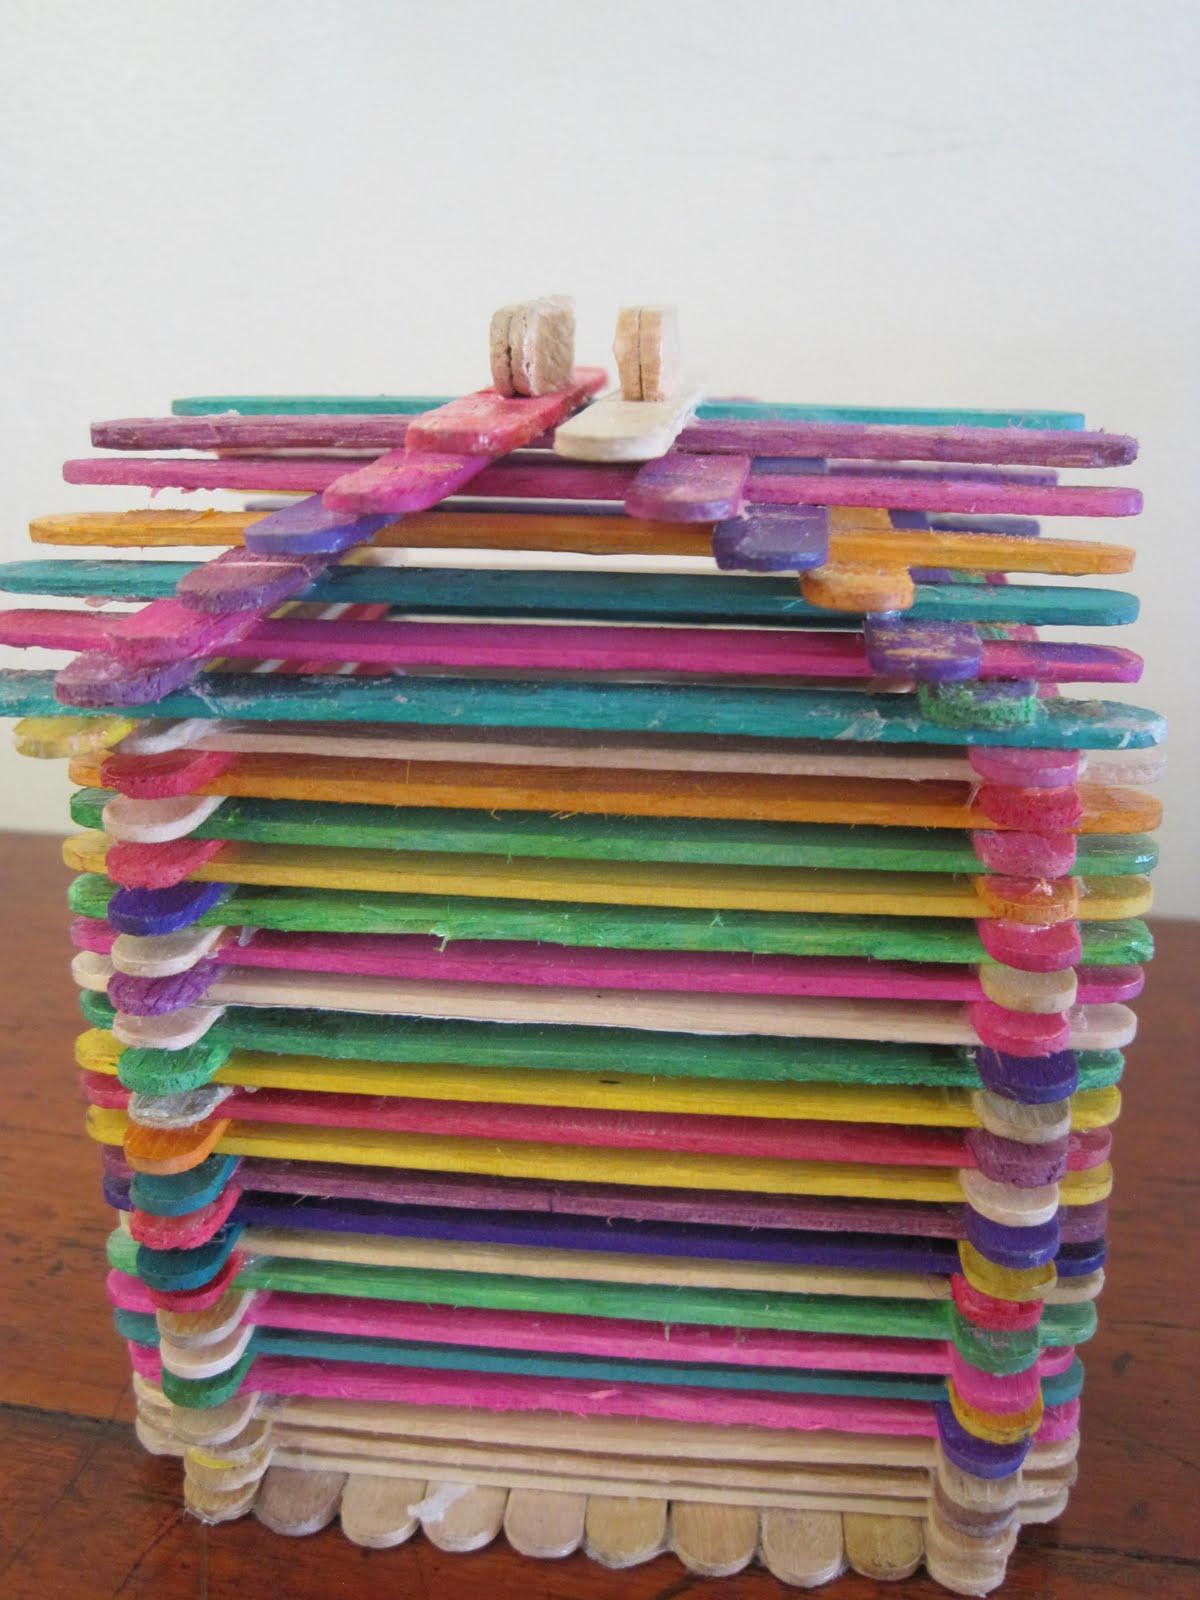 Dan teman-teman kami lainnya membuat pernak-pernik berupa tempat mainan  boneka 7f57d04afa